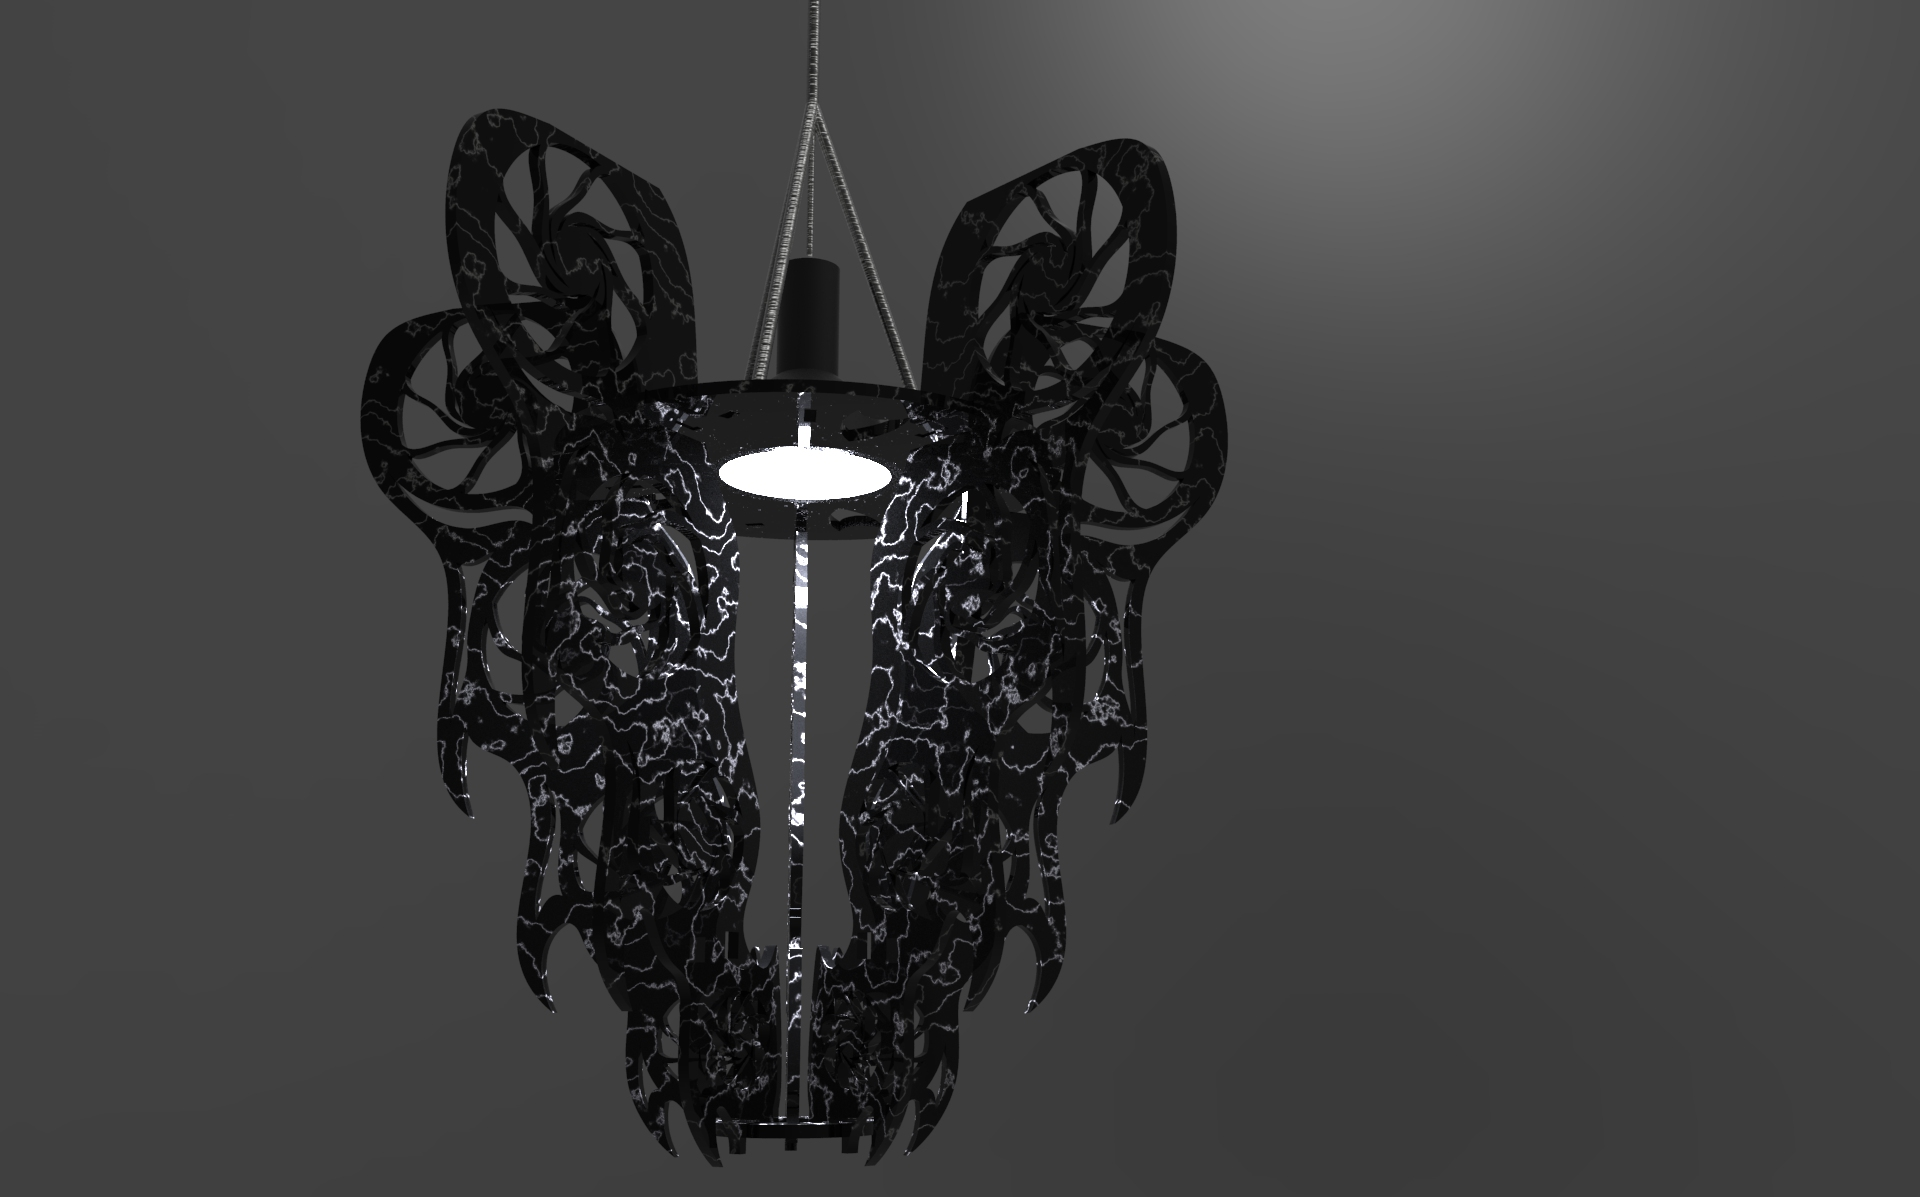 Final render black with white viens